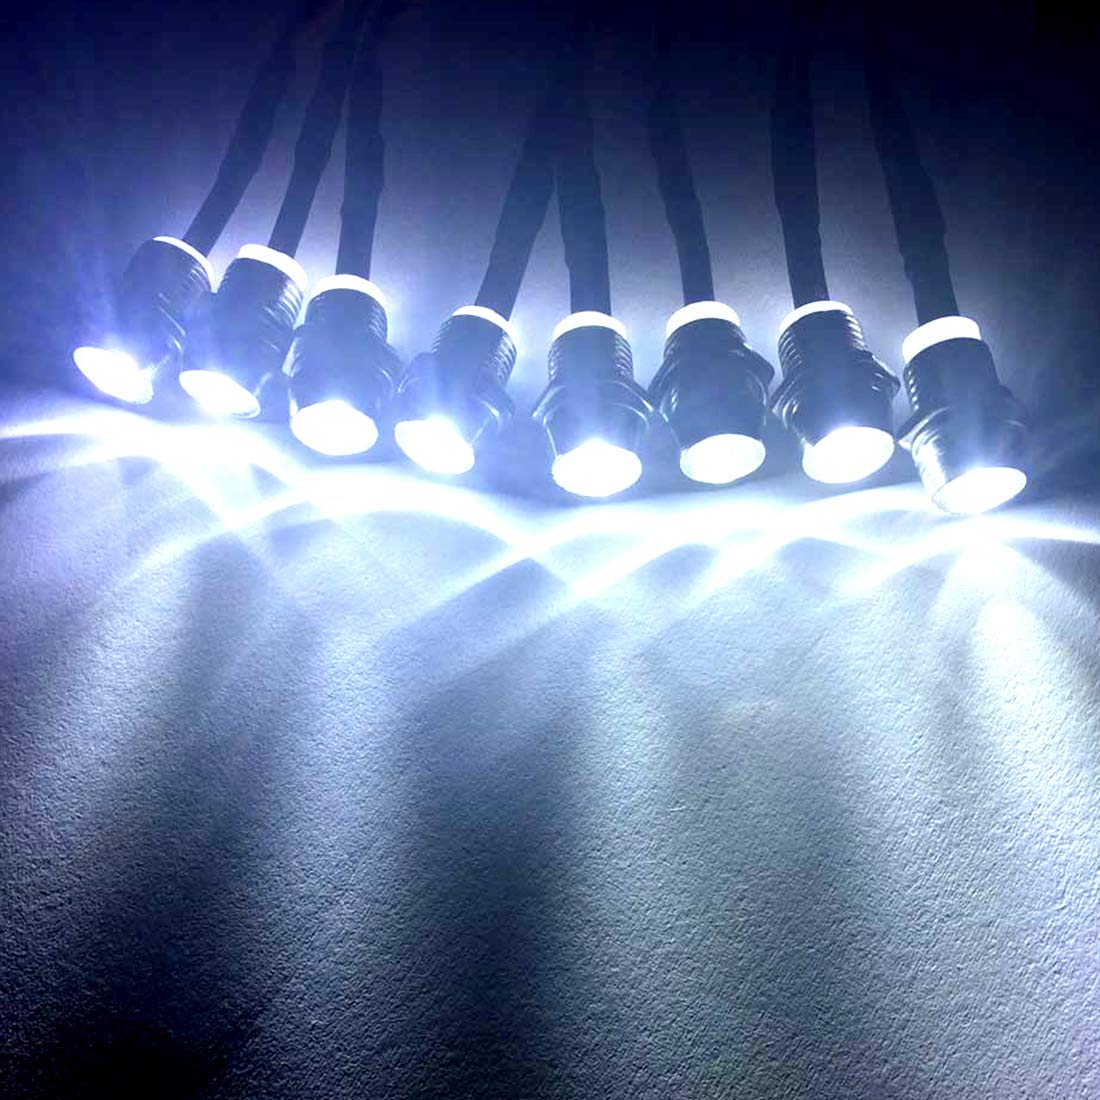 Kalevel Led Light for Rc Trucks Cars 8 LED Rc Car Led Light Kit Rc Truck Led Lights Rc Truck Light Kit Rc Car Headlights Taillight for Truck Rc Car Tank Hsp Tamiya D3 Rc Car Accessories